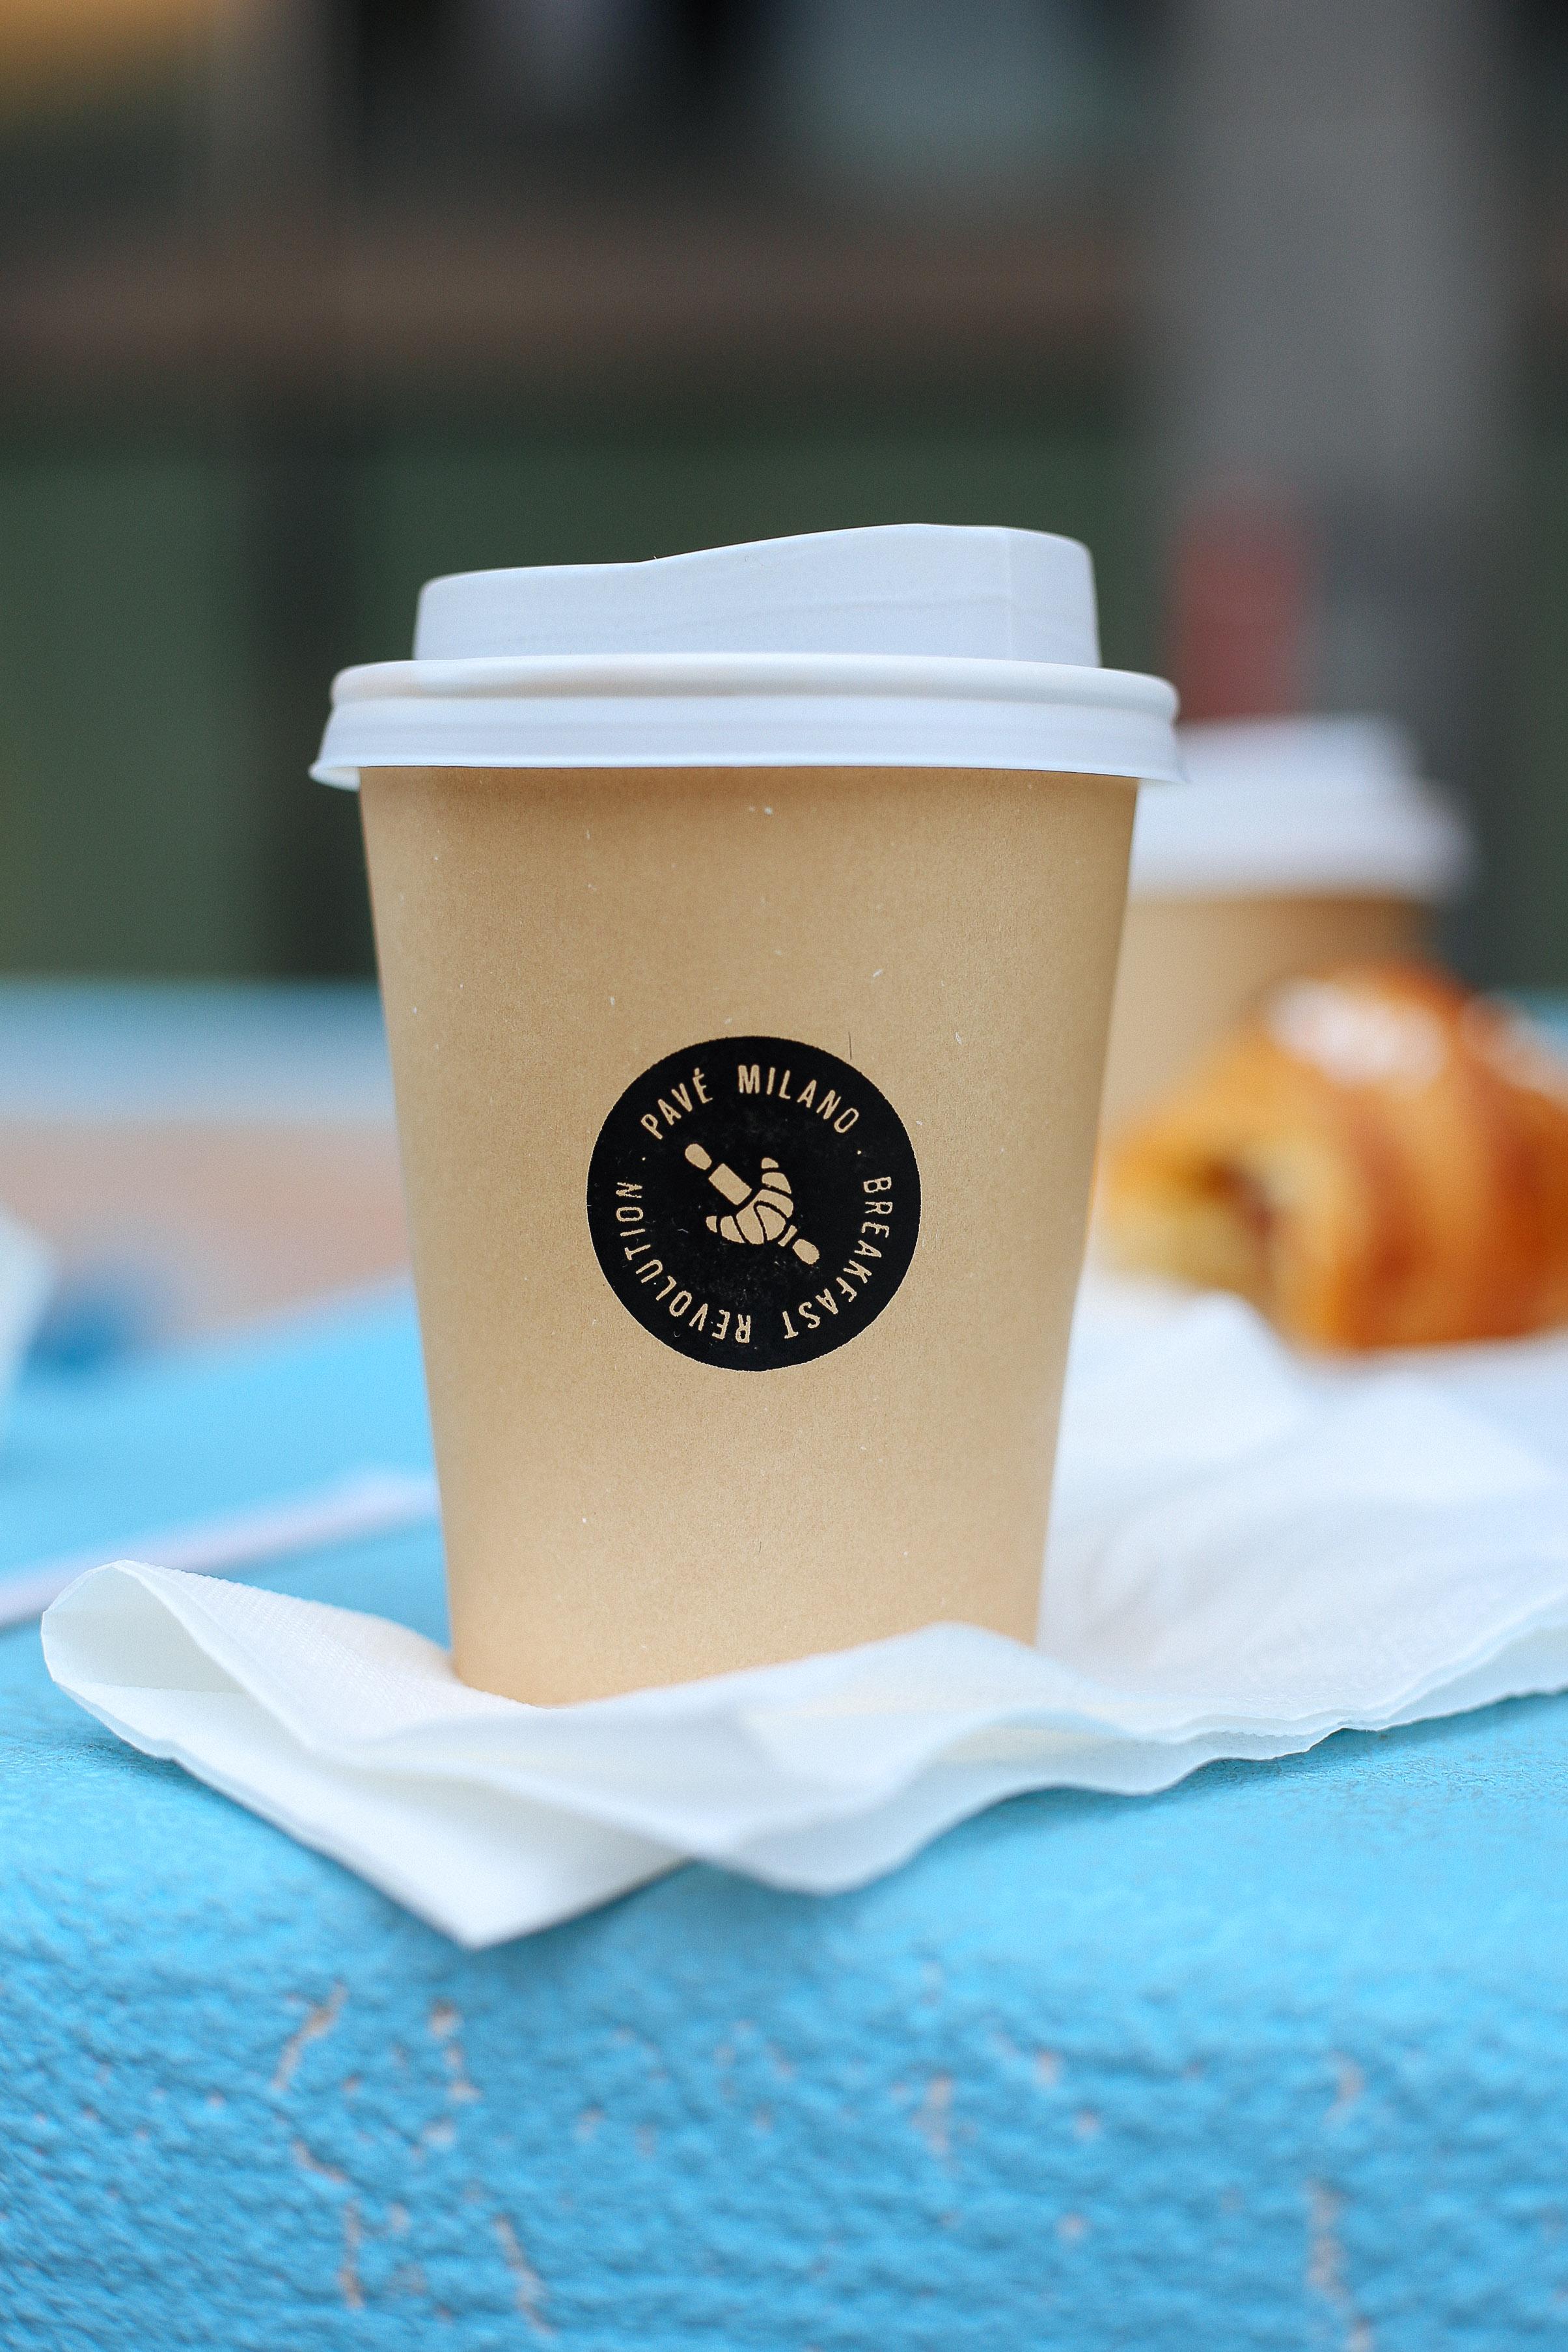 Pave-Milan-Coffee